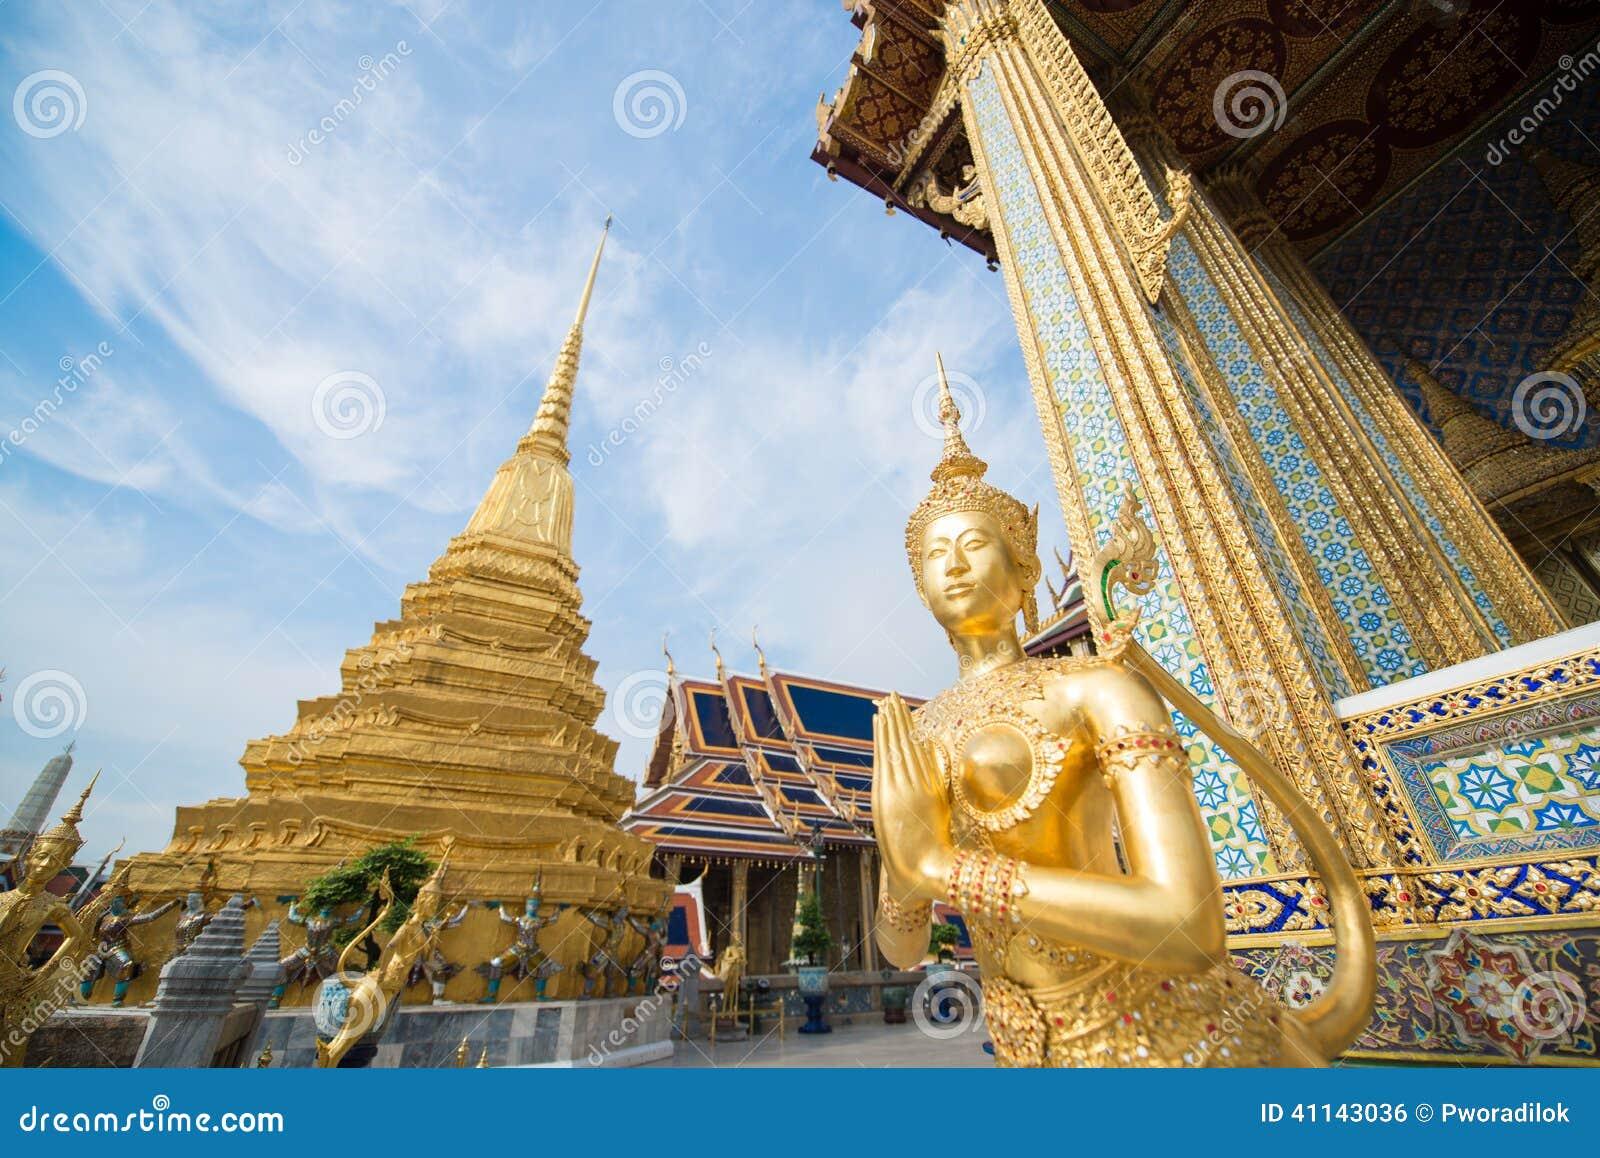 Iconic Golden Kinnari Stock Photo - Image: 41143036